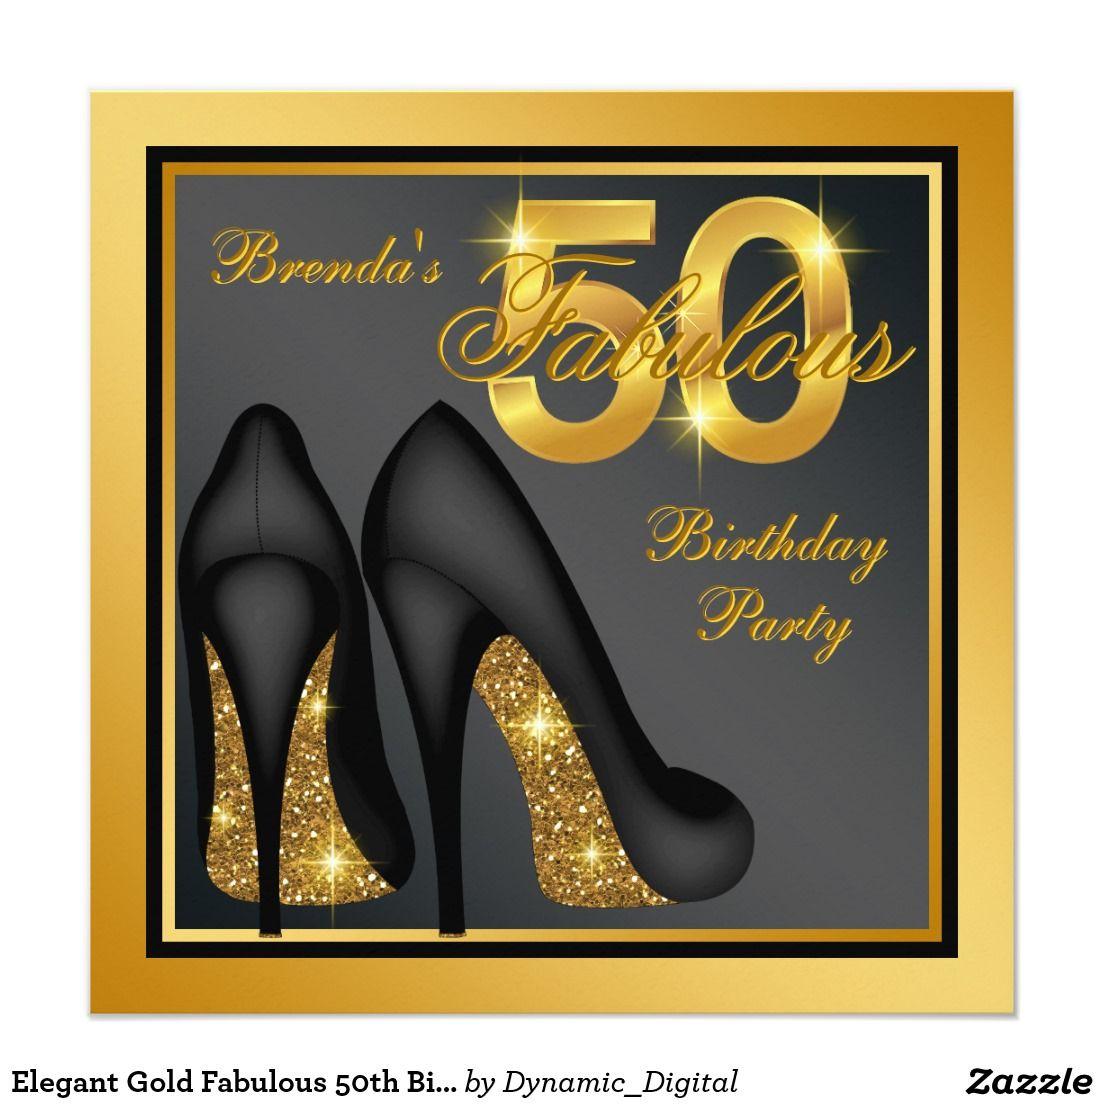 50 Fabulous Graphic: Elegant Gold Fabulous 50th Birthday Party Invitation